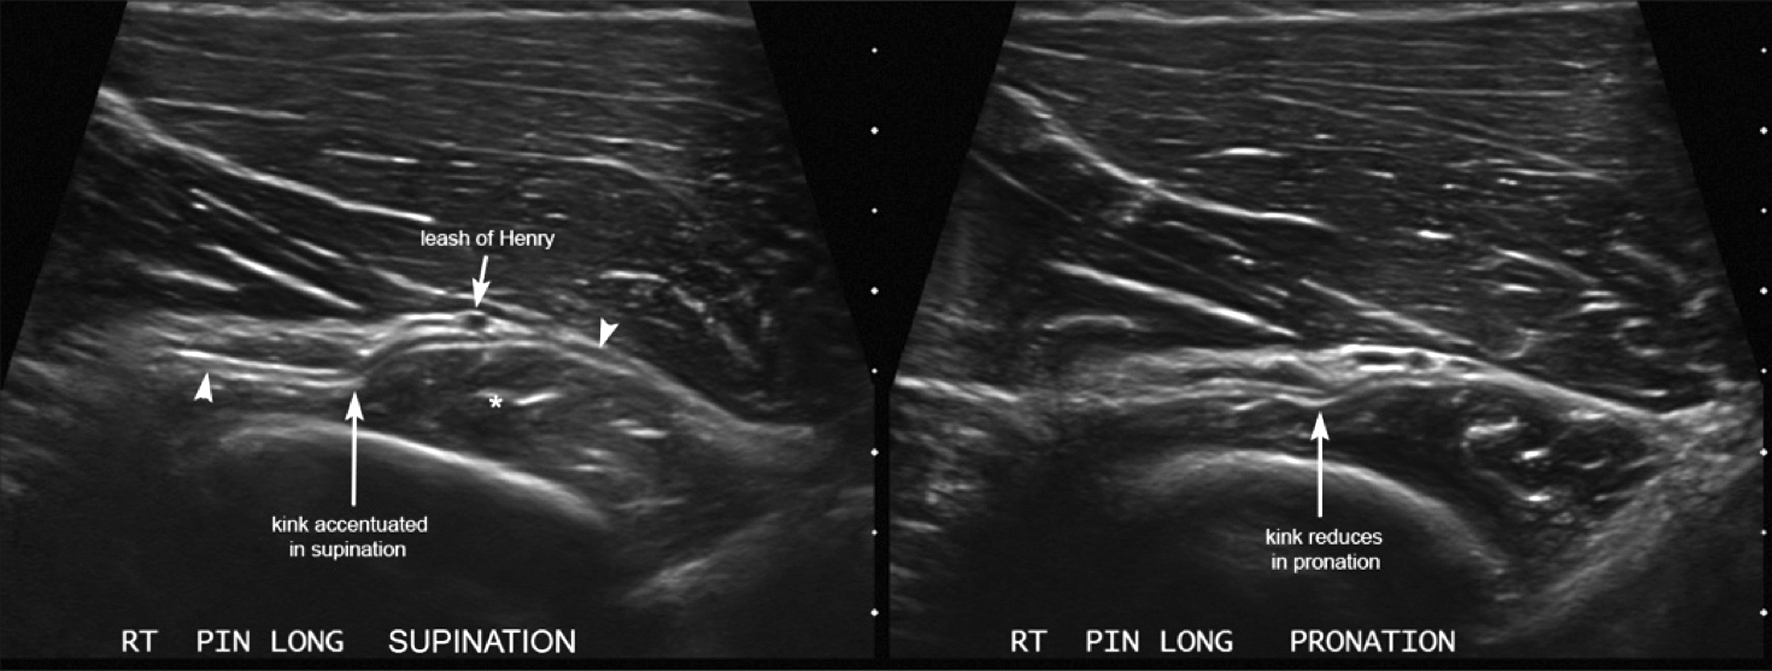 Elbow Case 1 - Sports Medicine Imaging